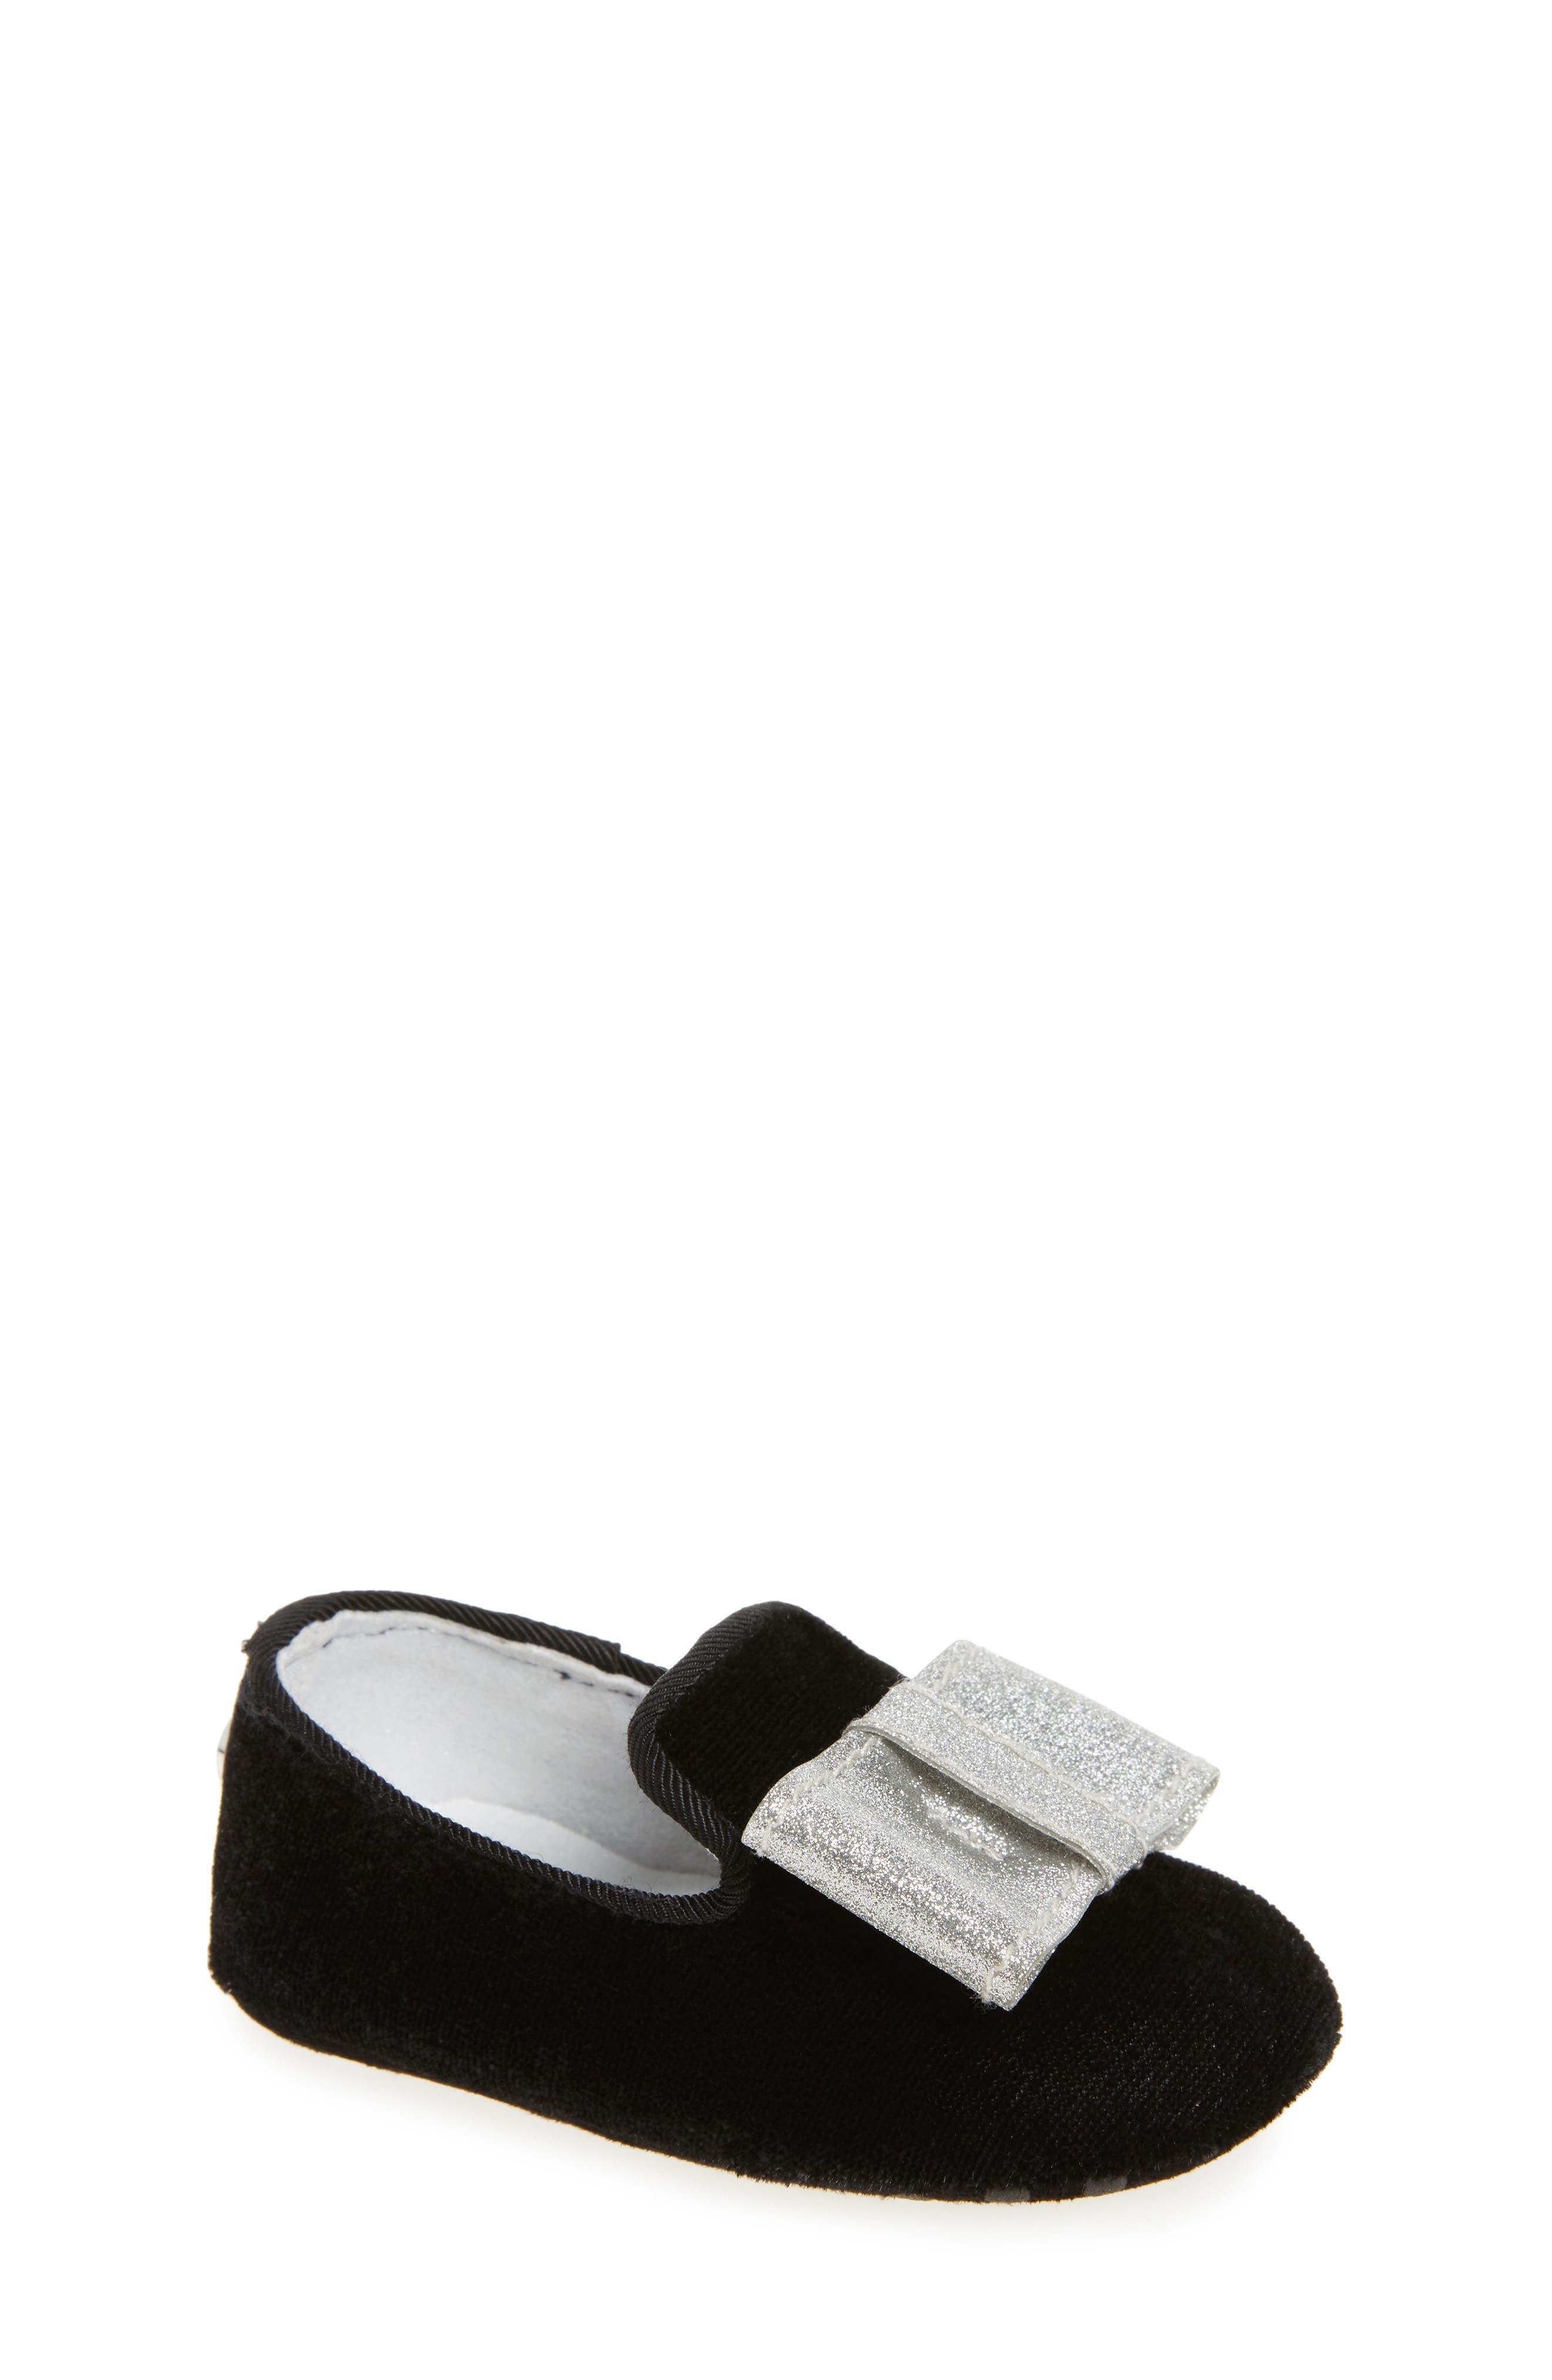 Stuart Weitzman Bow Loafer Crib Shoe (Baby)